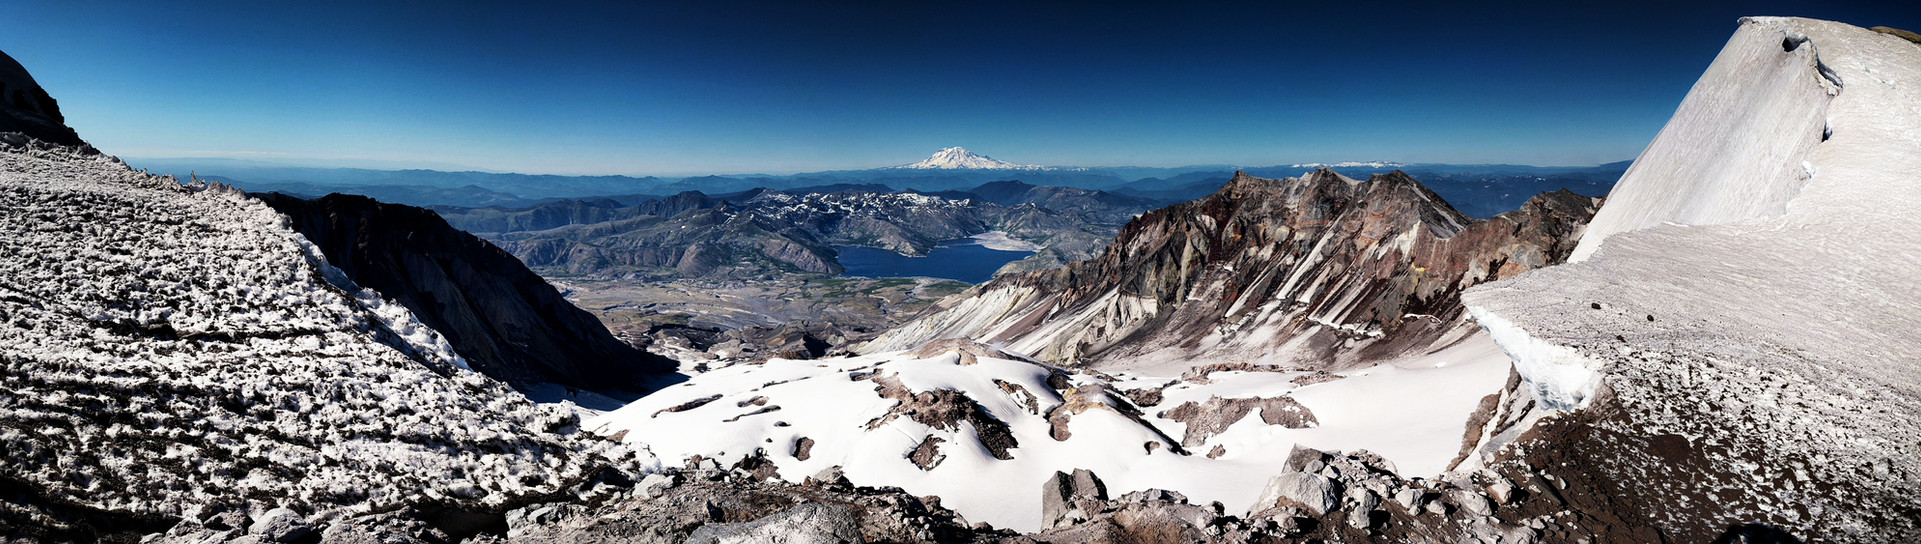 Mt. Saint Helens Crest, Wa